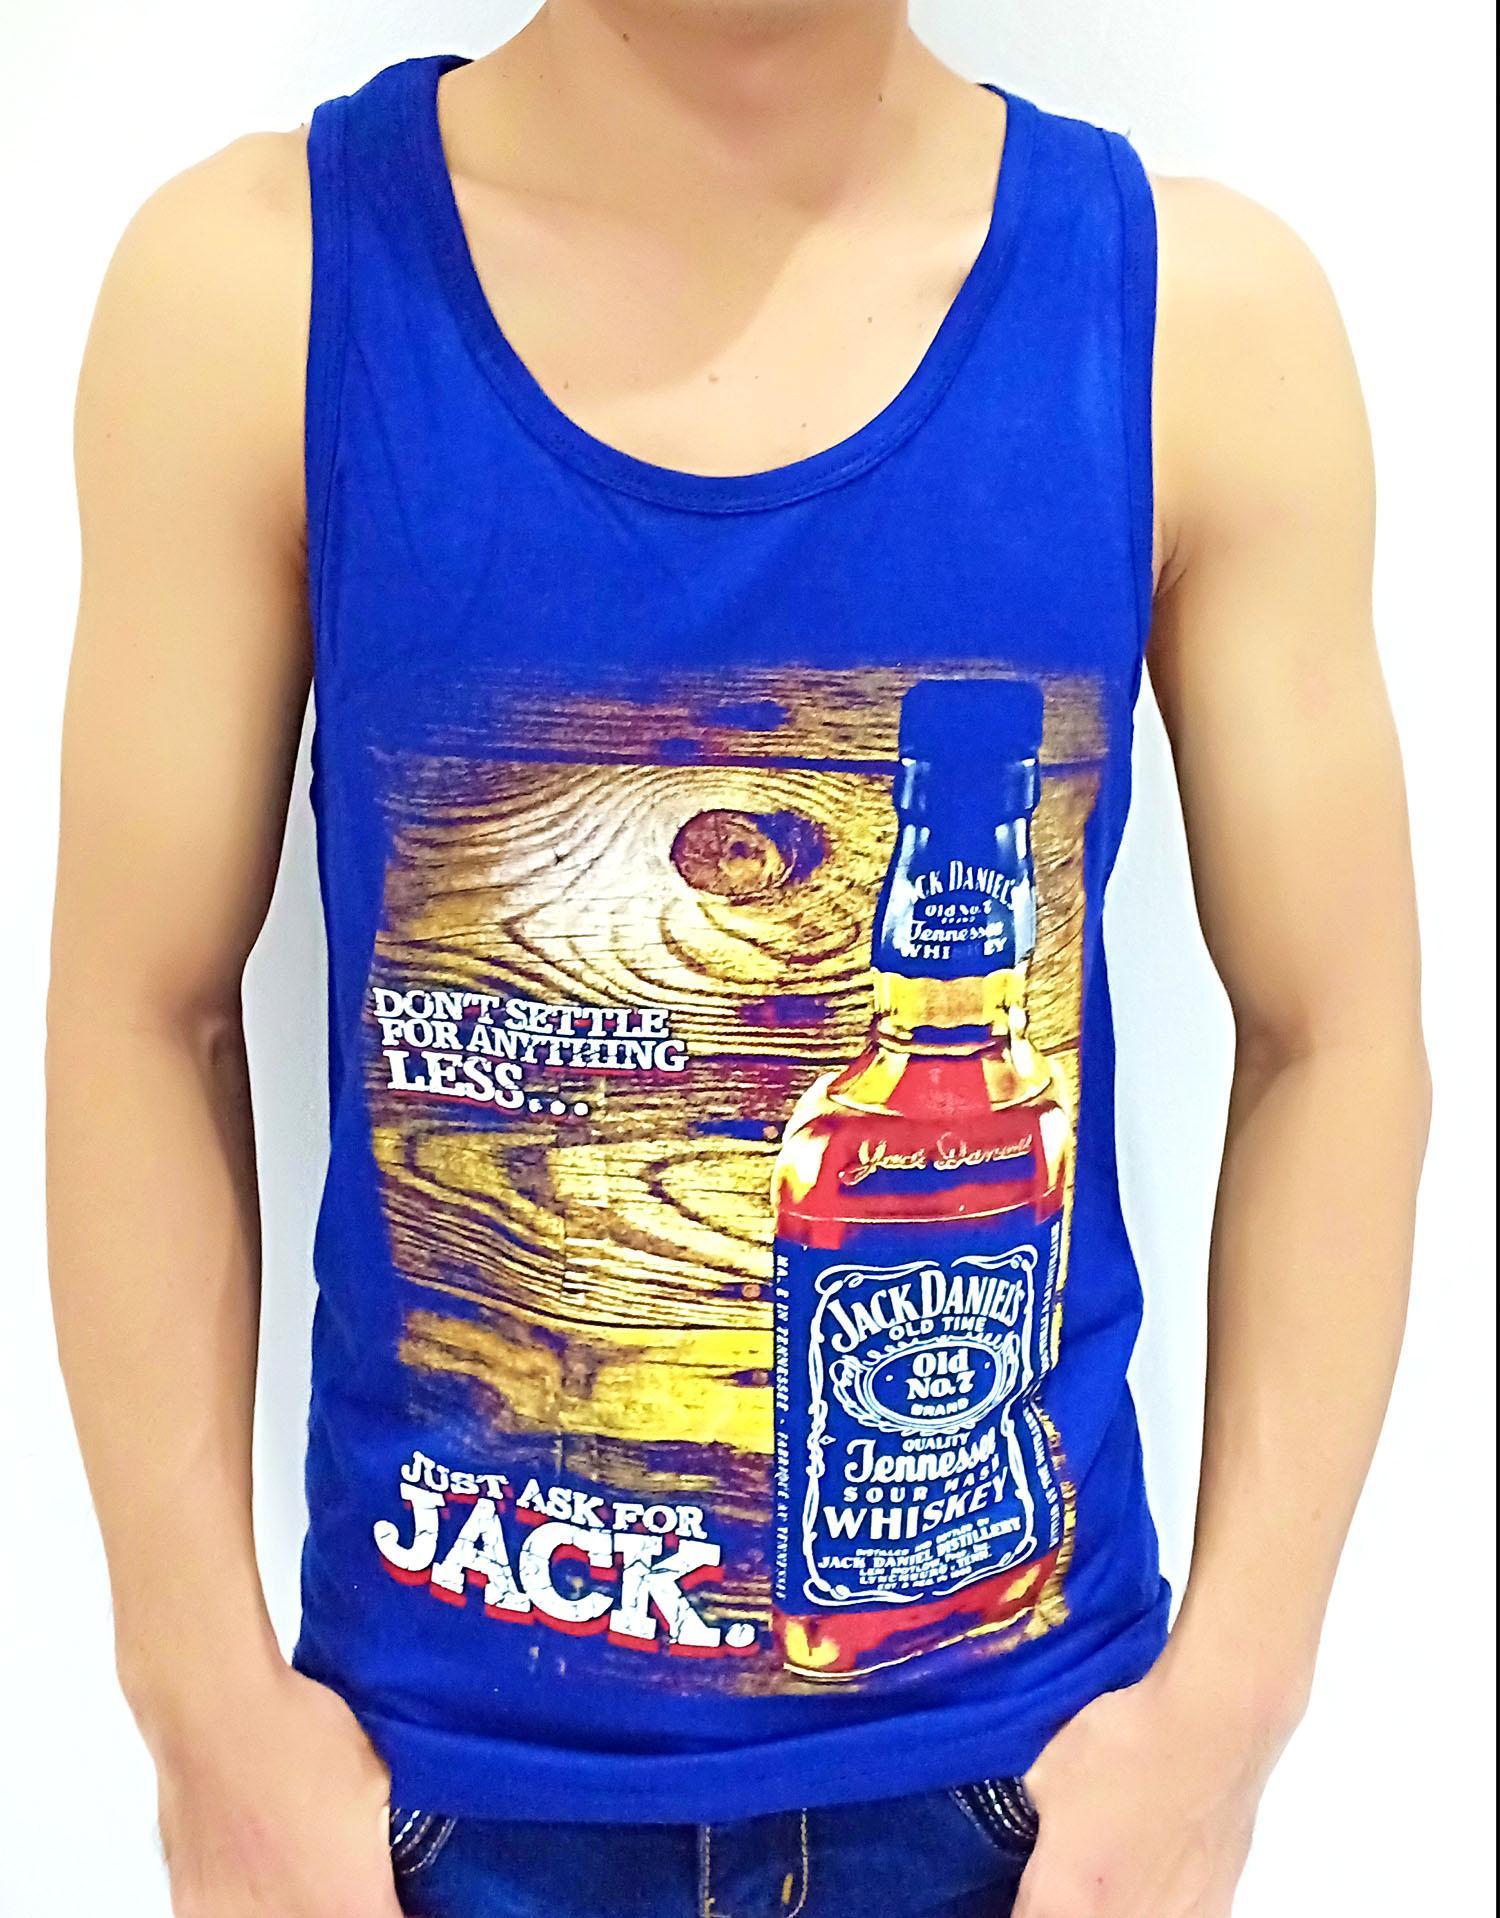 Cikitashop - Kaos T-Shirt Distro / Kaos Pria / T-Shirt Pria /